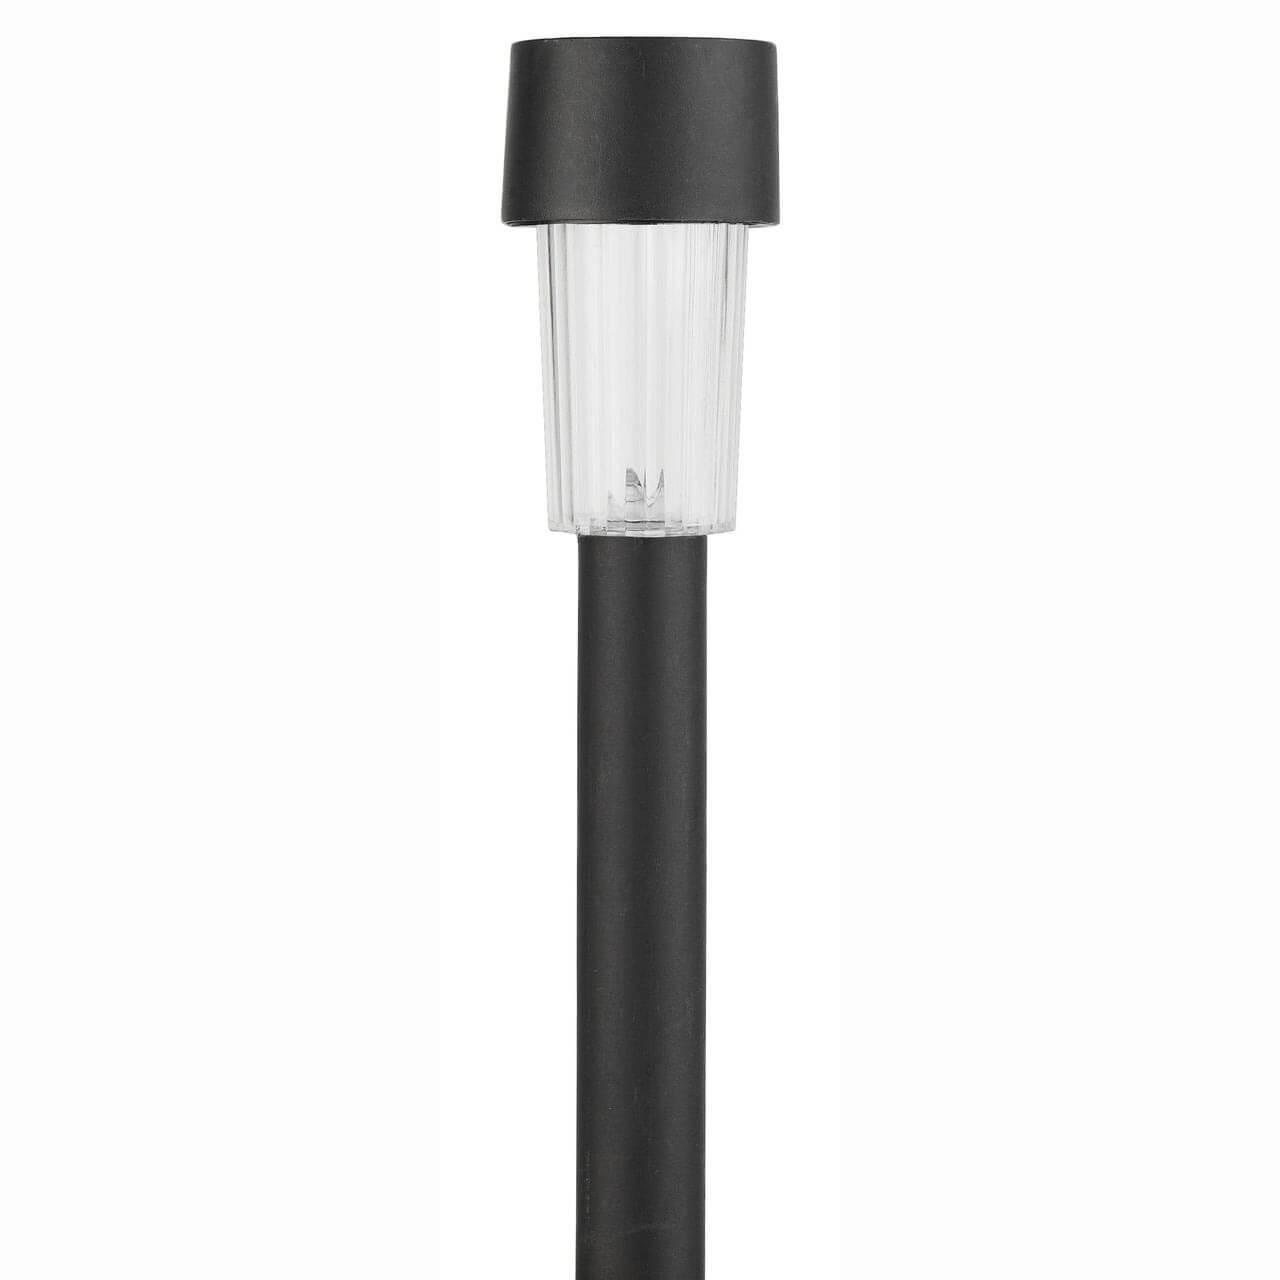 Светильник на солнечных батареях ЭРА SL-PL30 Б0018974